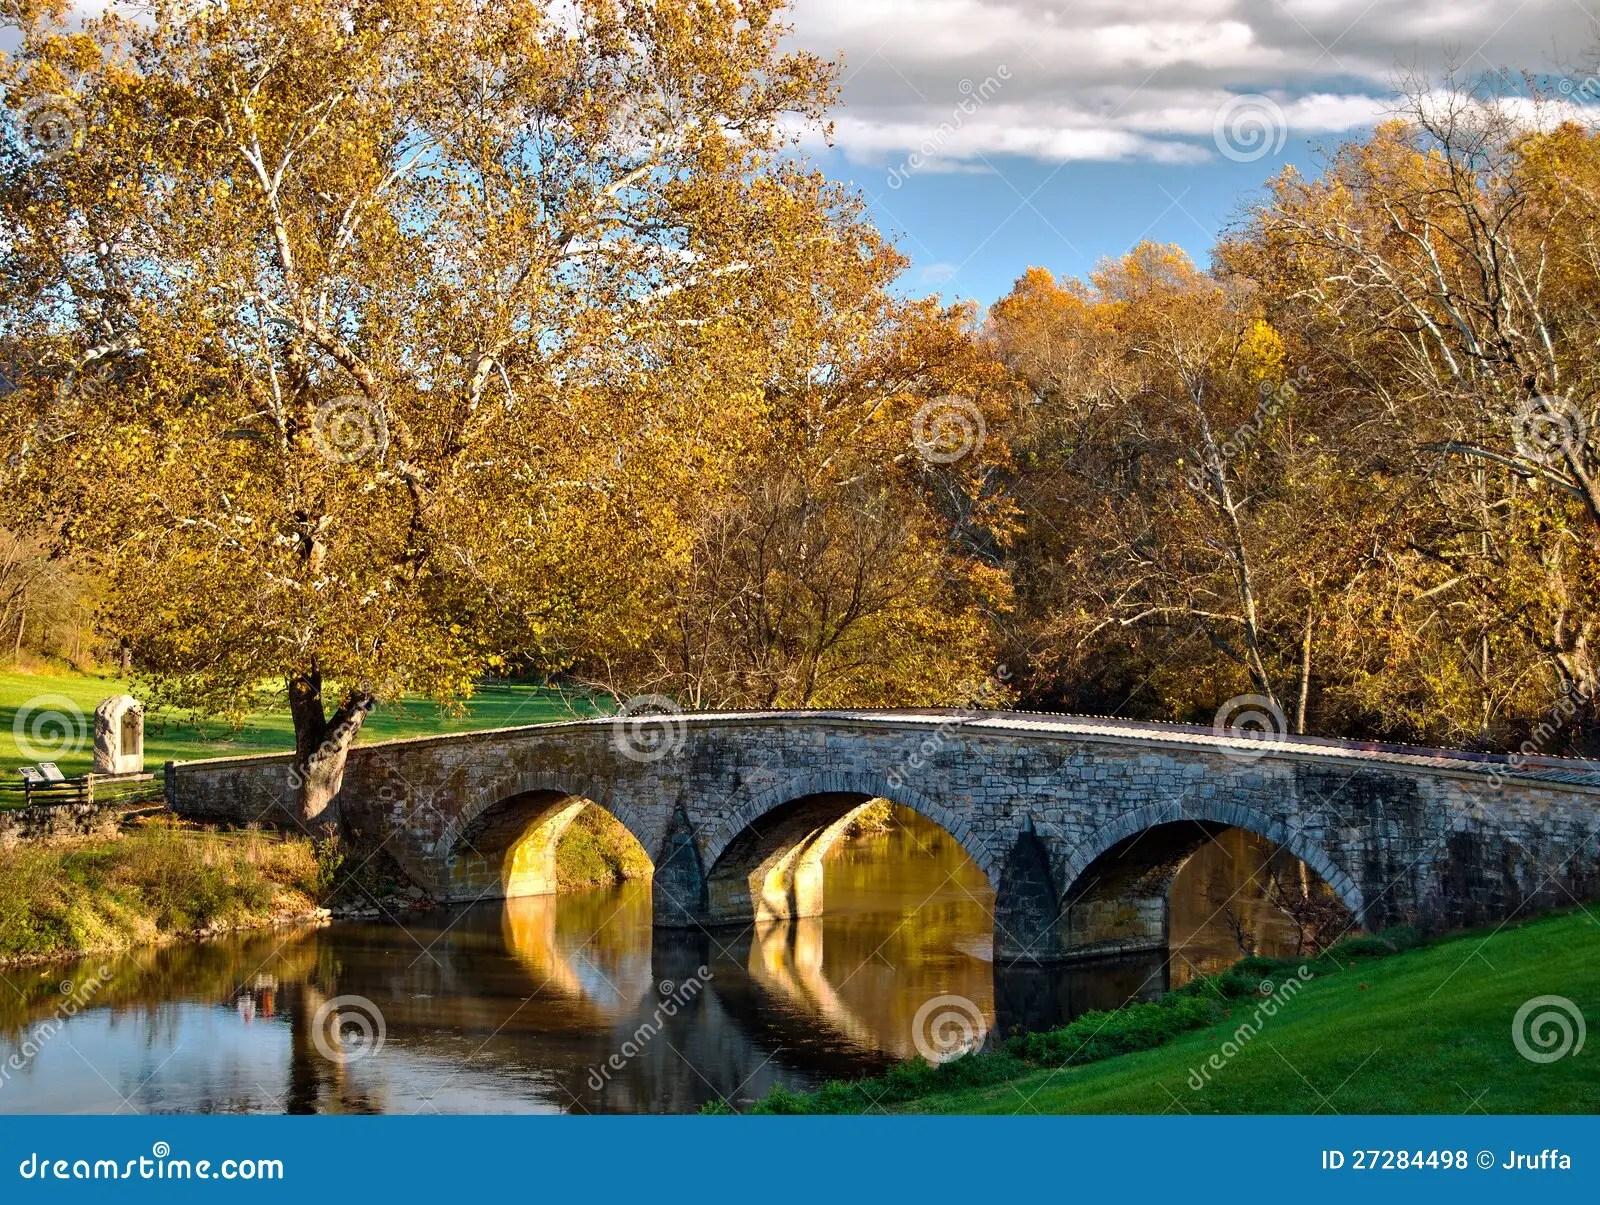 Free Wallpaper Fall Season Old Stone Bridge At Antietam National Battlefield Stock